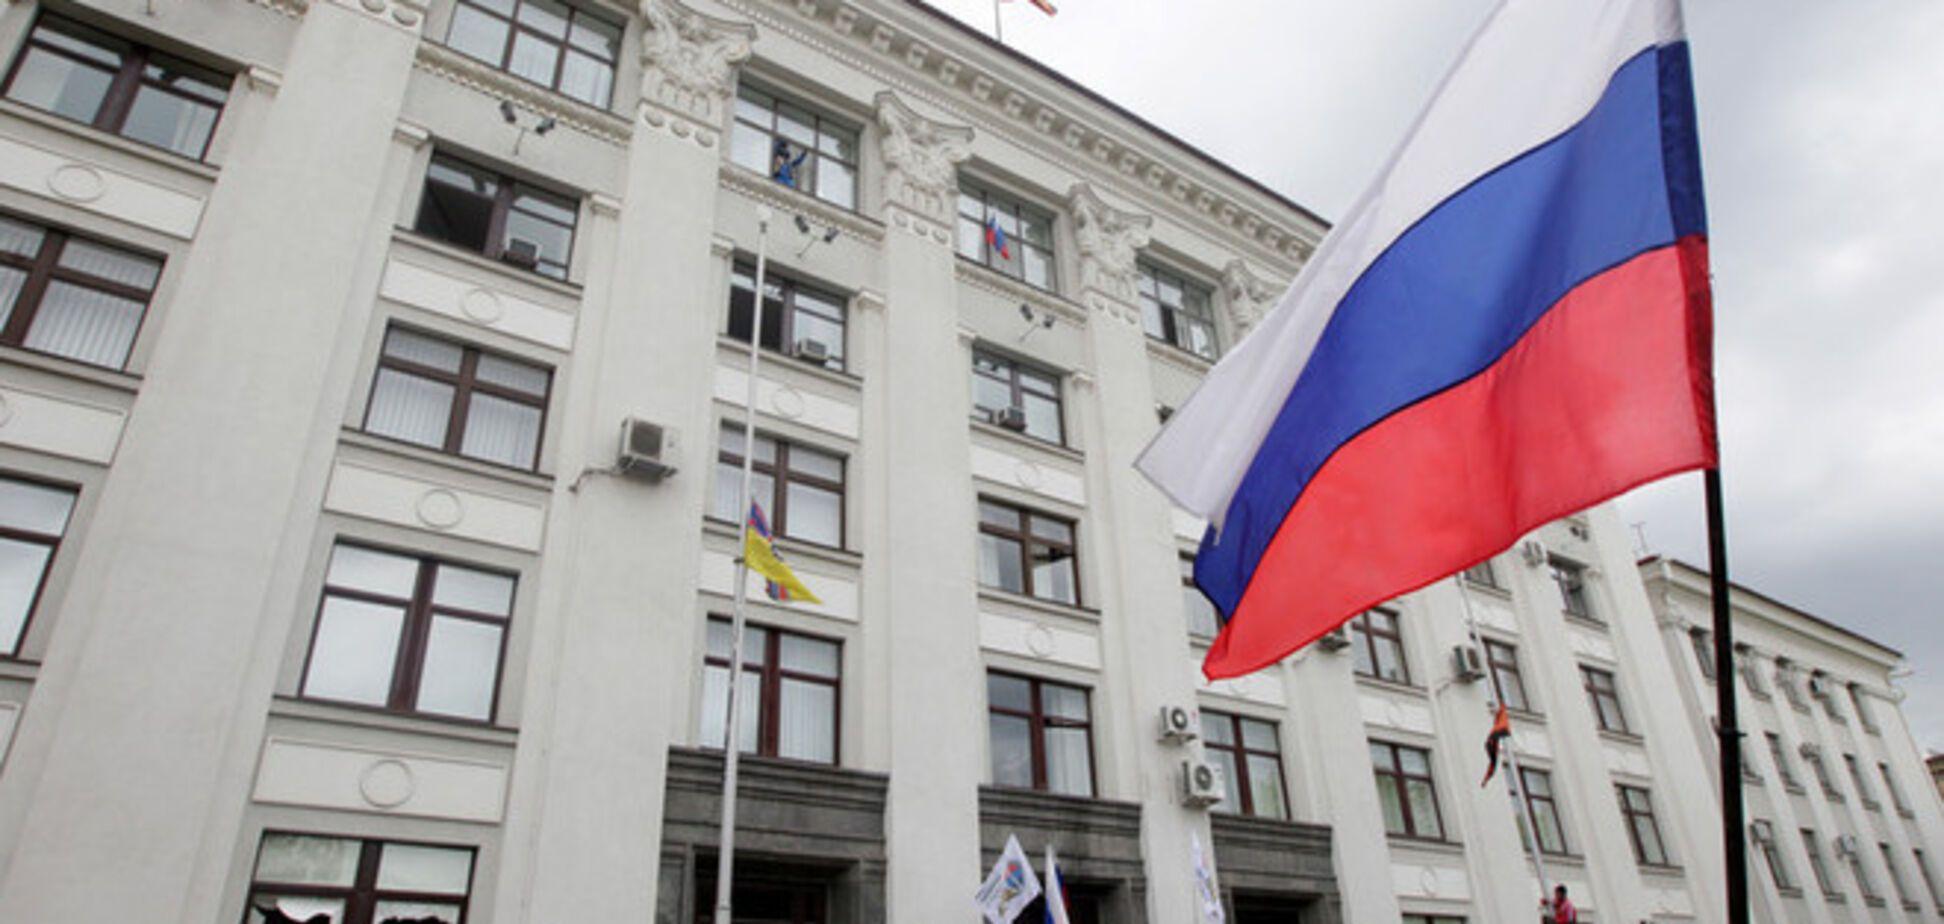 ГПУ уже расследует факт захвата Луганской ОГА